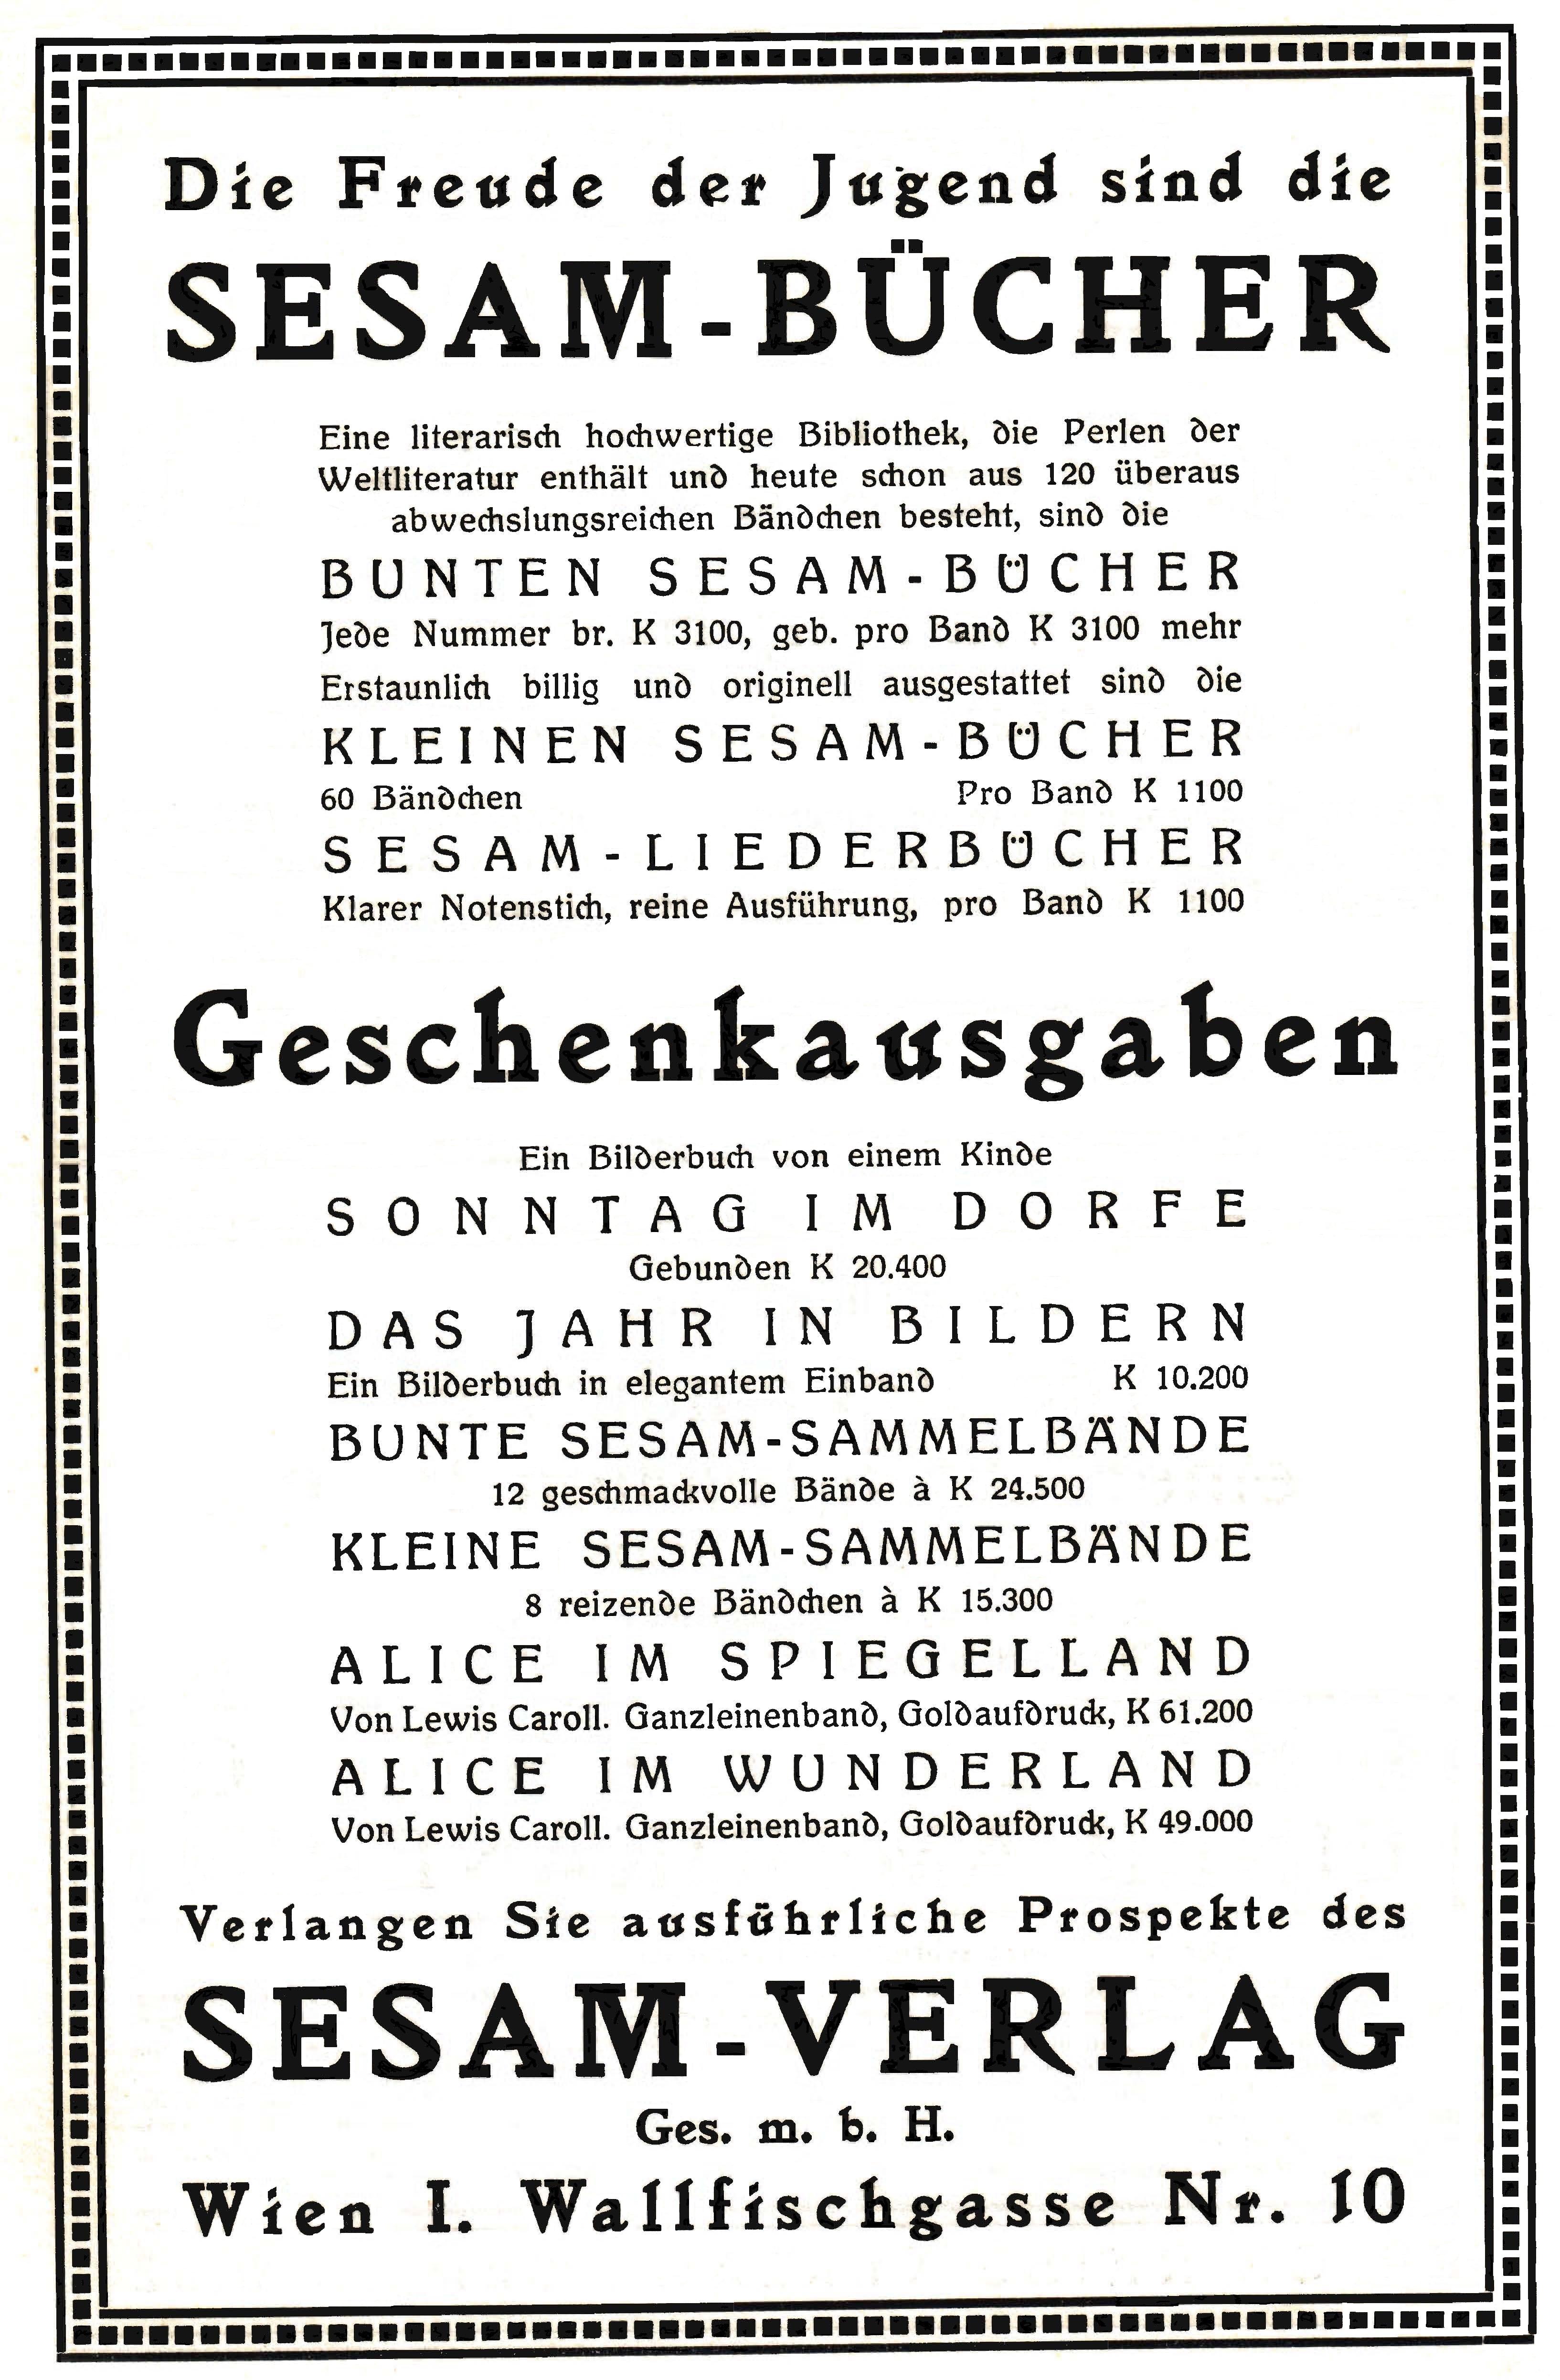 Sesam Verlag Anzeige